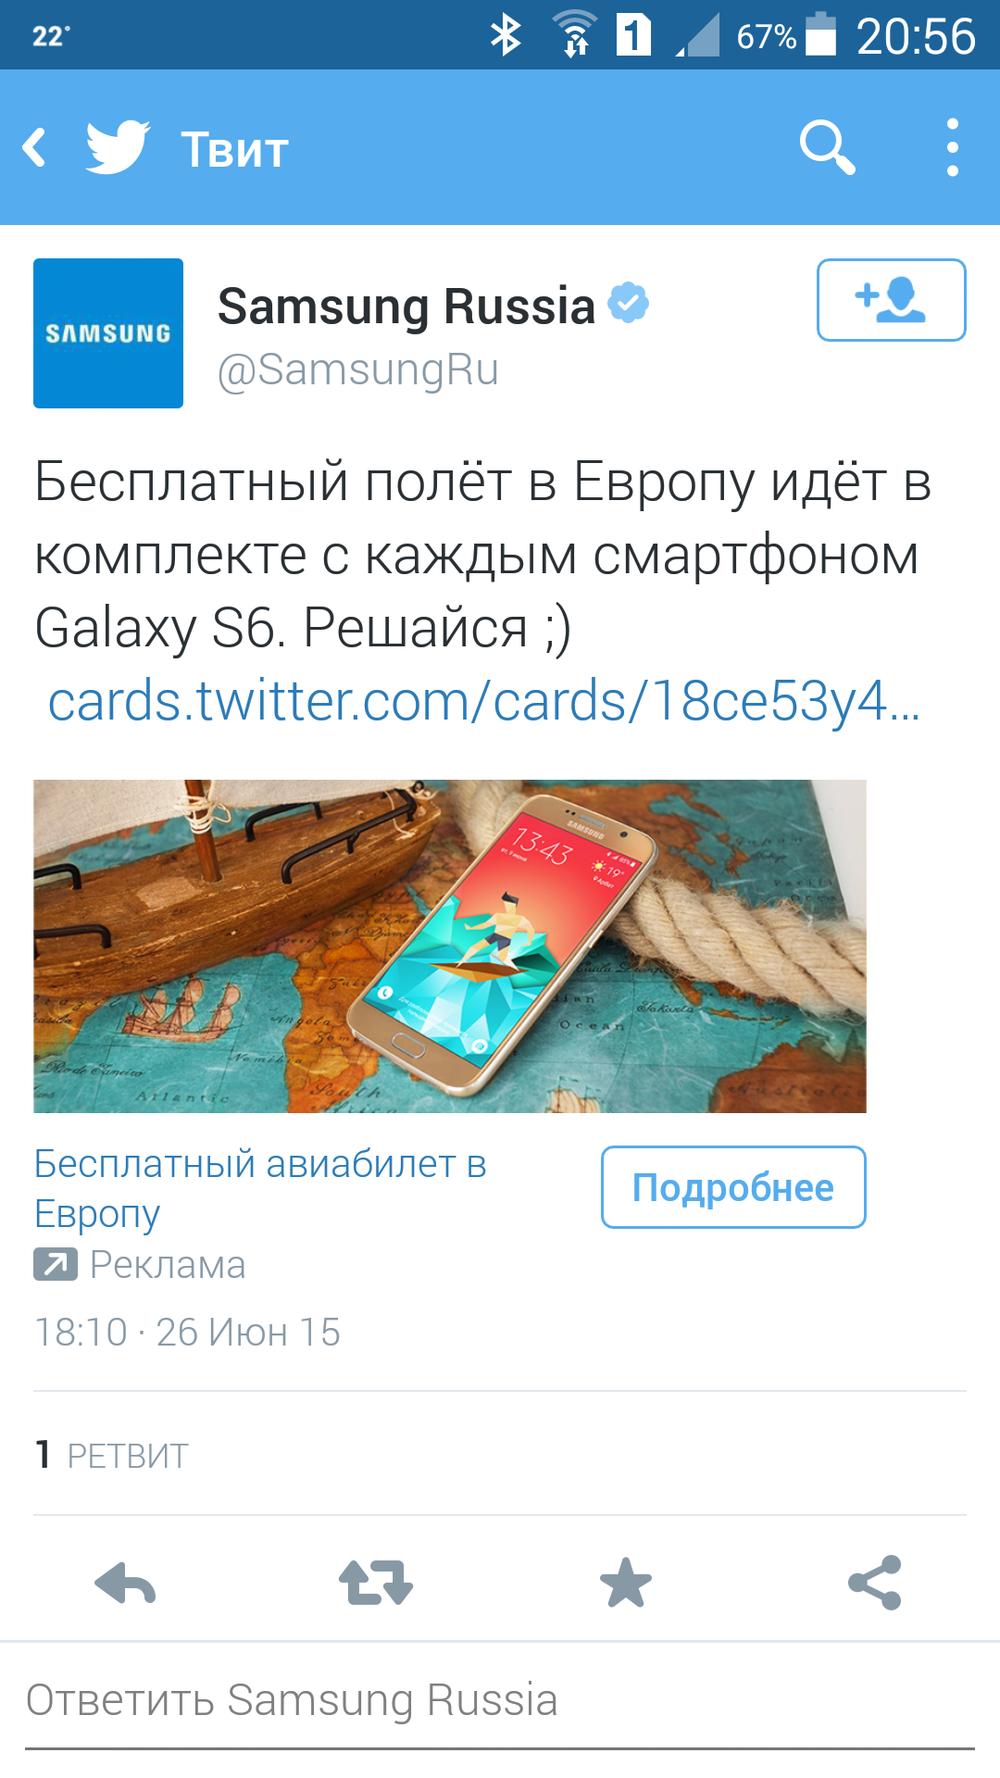 Screenshot_2015-06-26-20-56-48.png